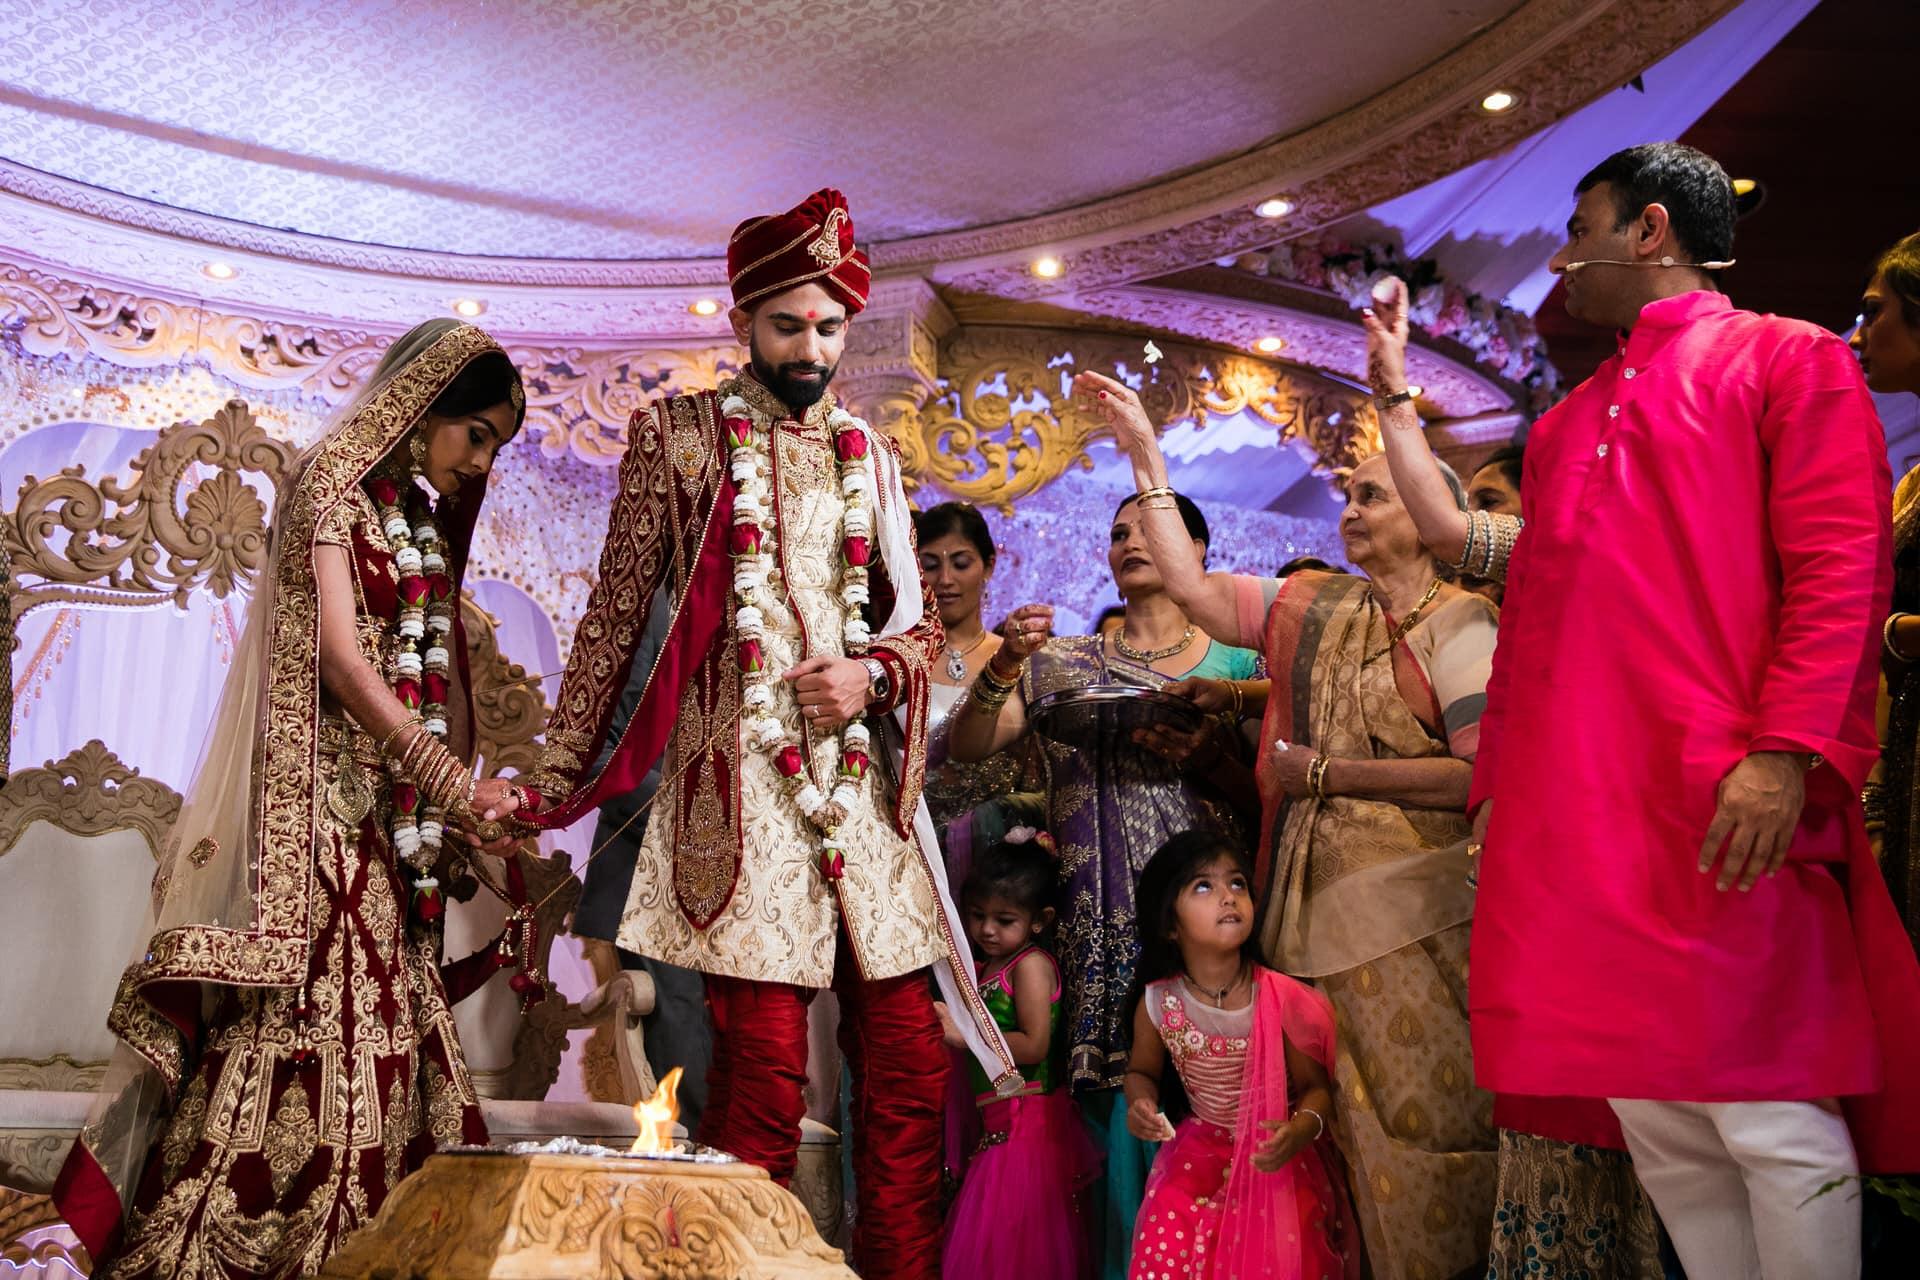 Phera ceremony during Hindu Wedding